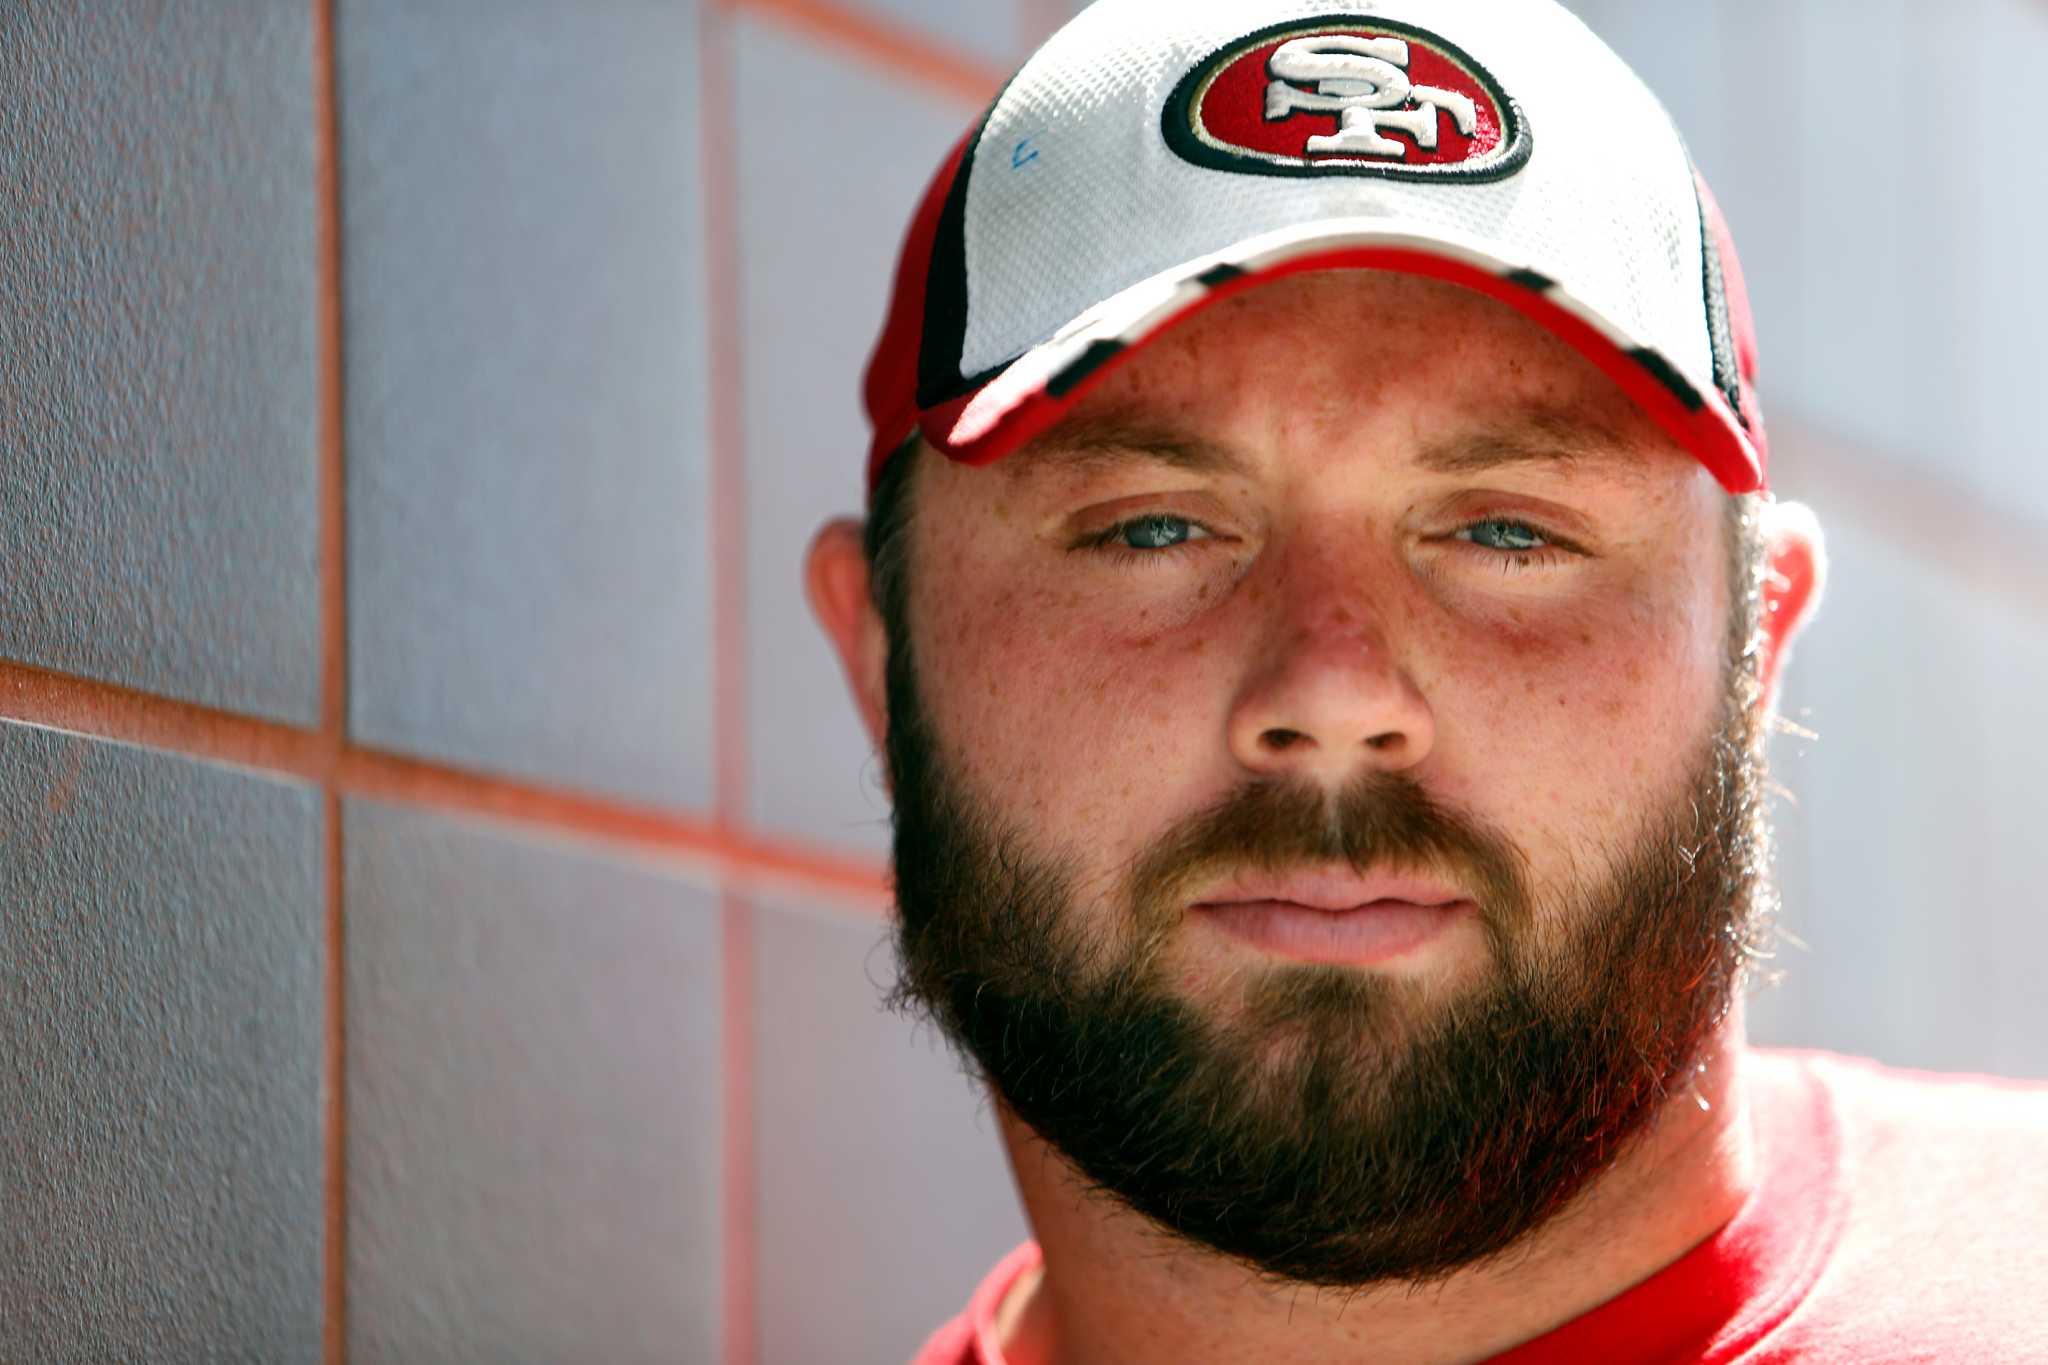 49ers kilgore a gentle giant when not a ferocious center sfgate